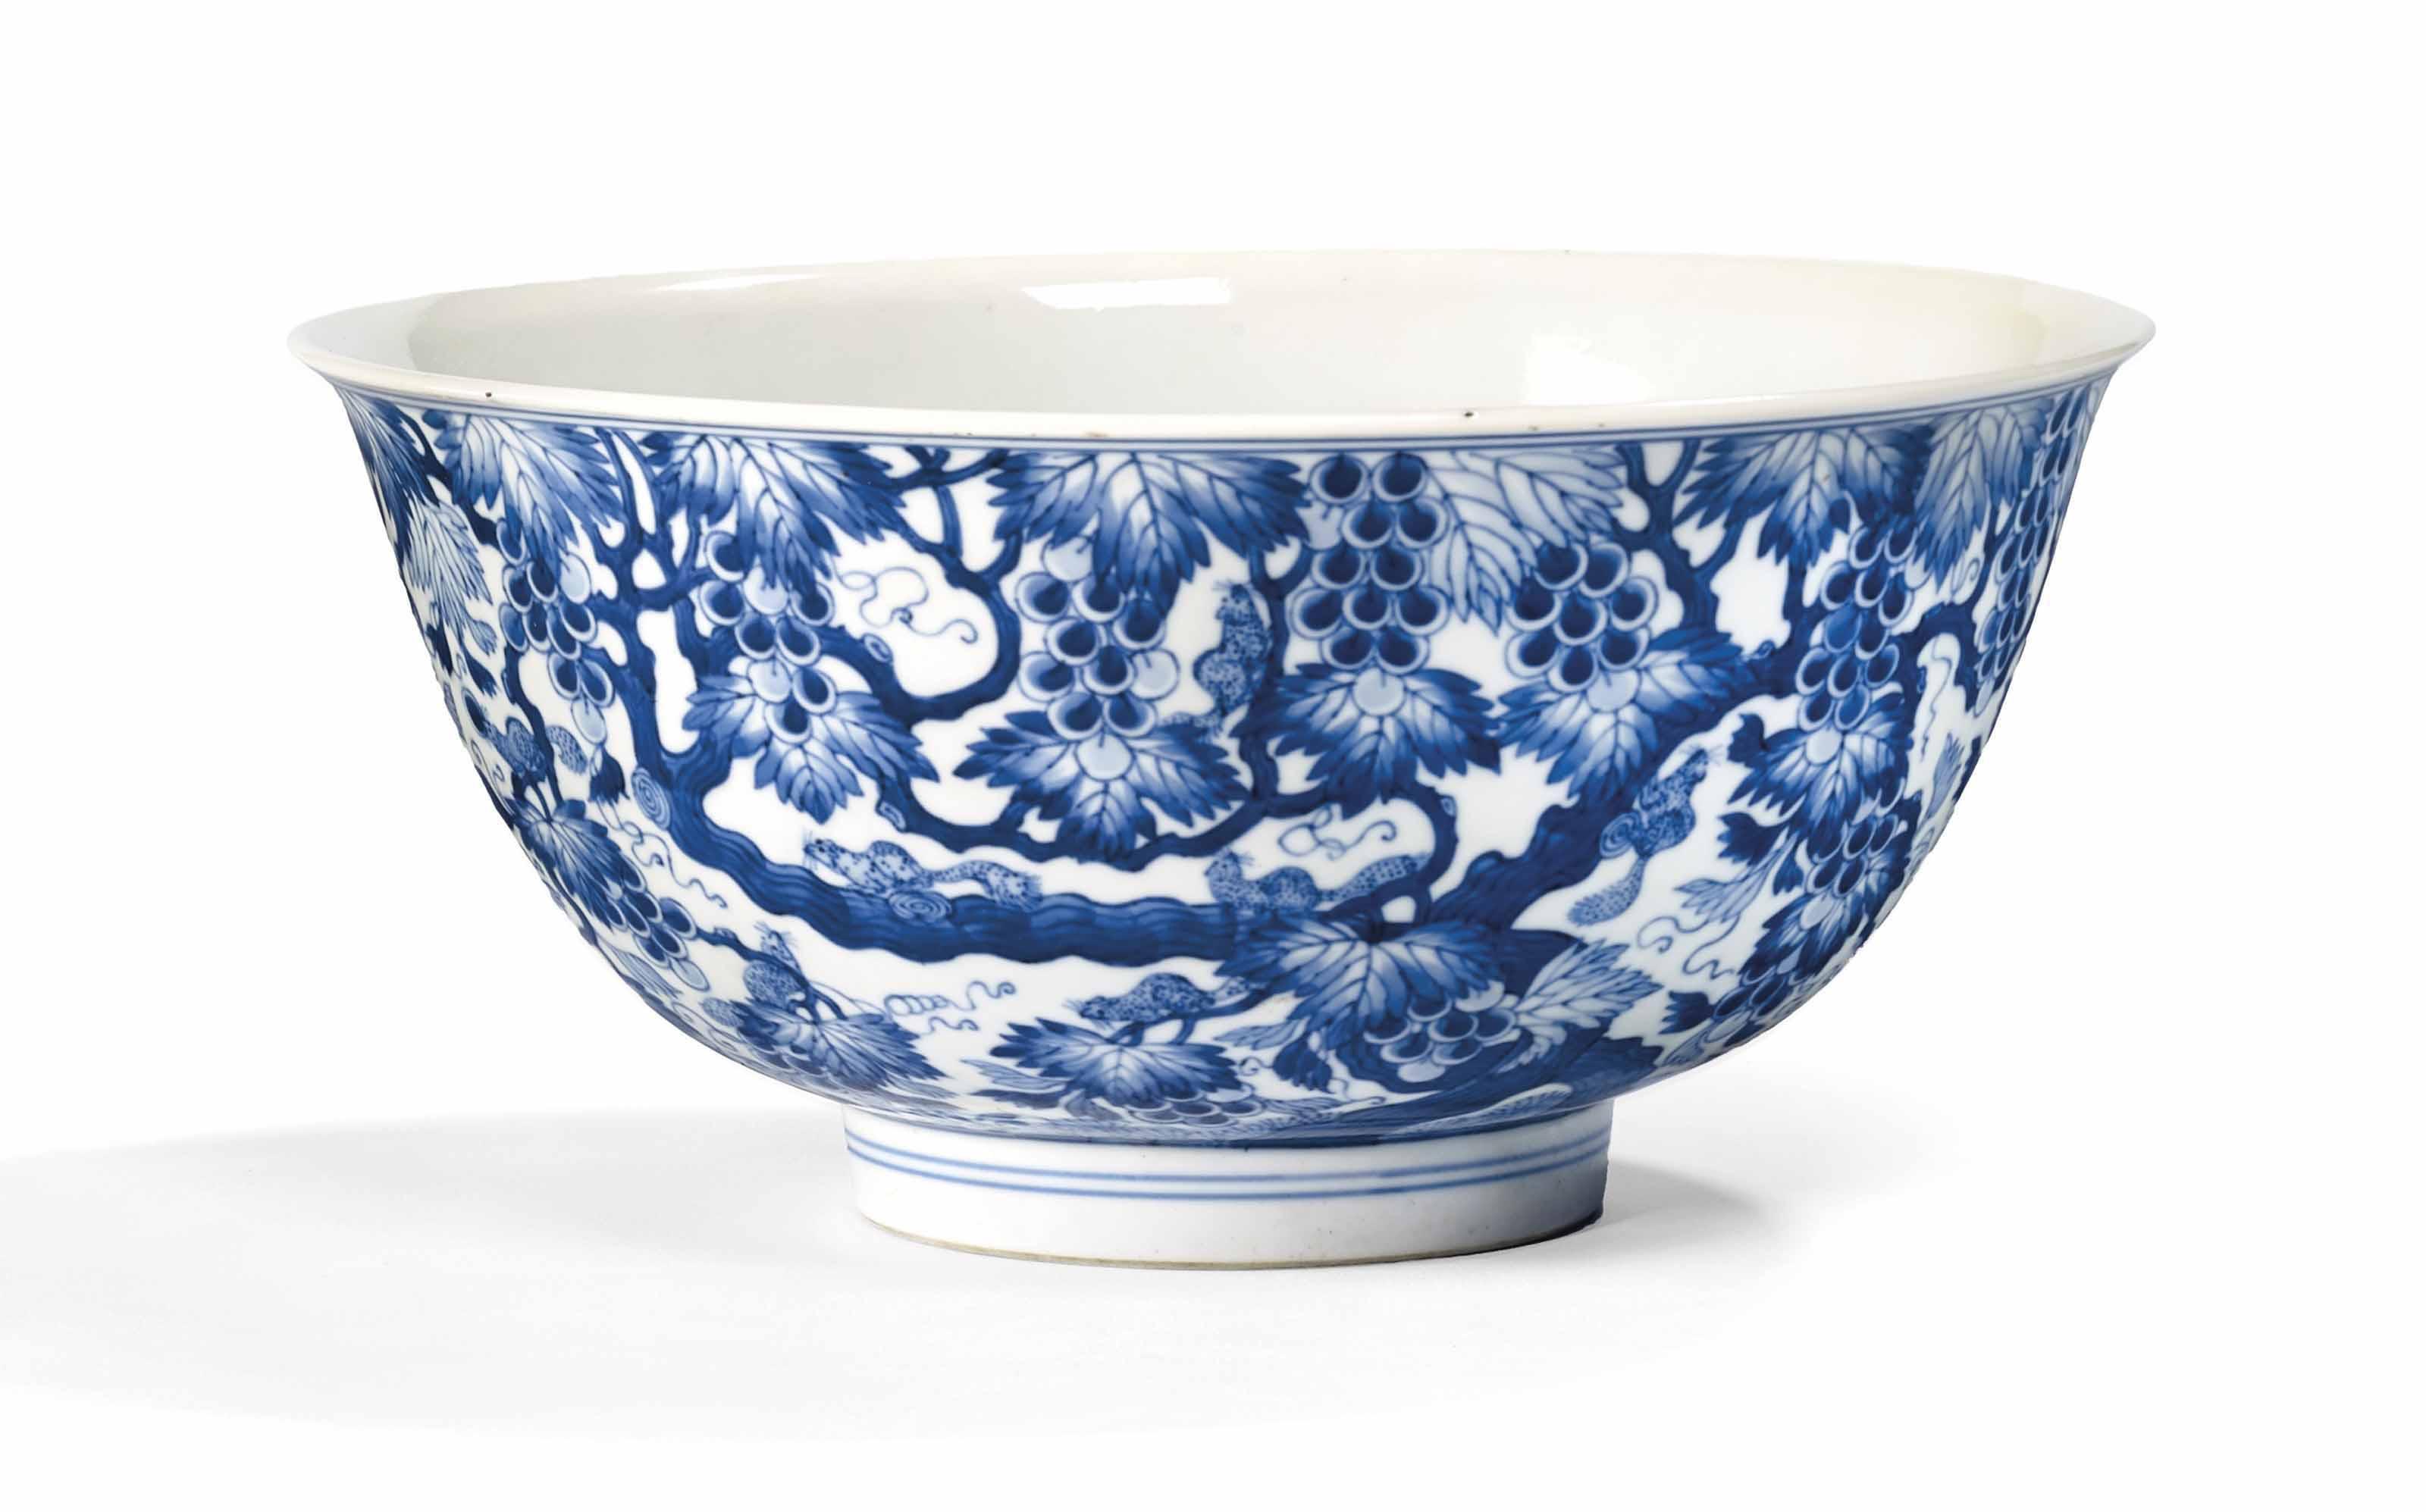 grand bol en porcelaine bleu blanc chine dynastie qing marque a six caracteres en cachet en. Black Bedroom Furniture Sets. Home Design Ideas